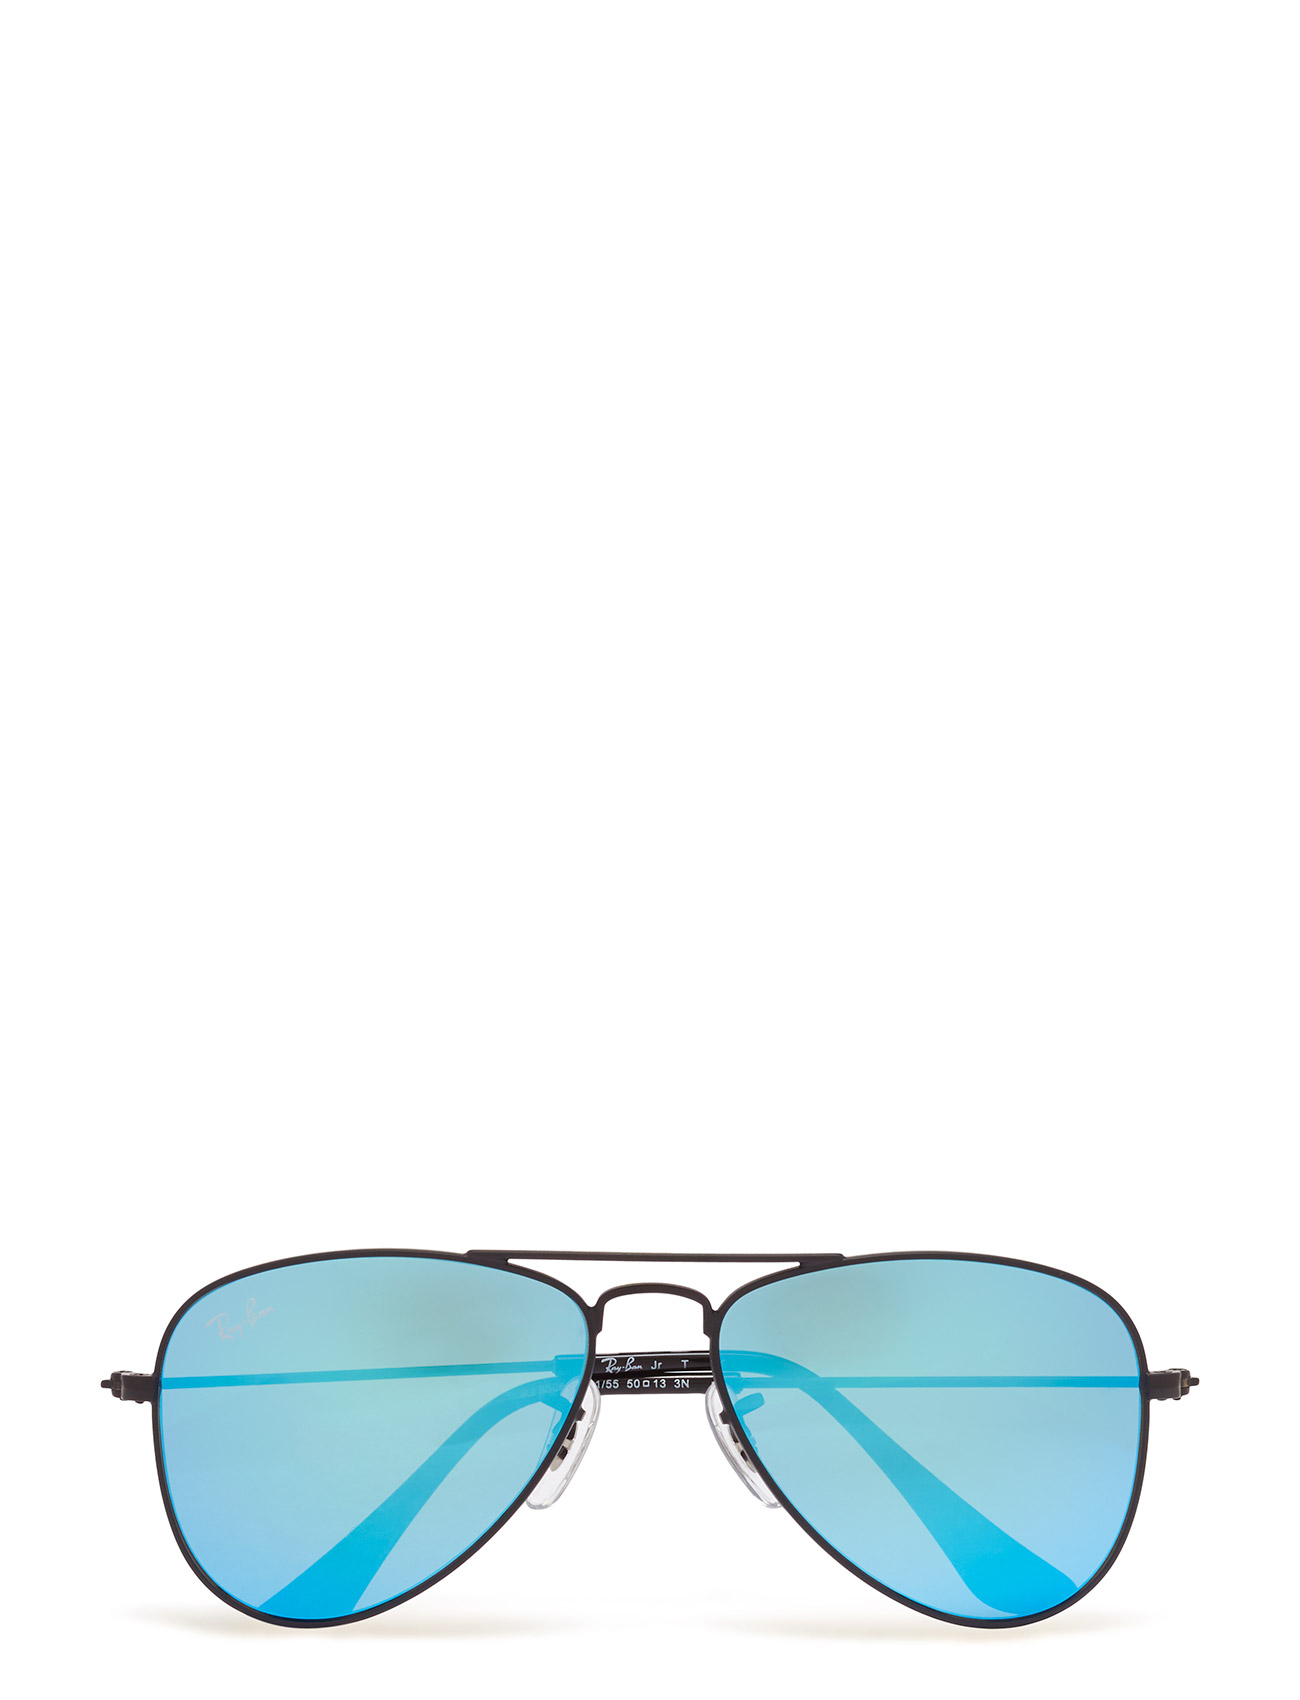 3517799339d3 GOLD-GREEN Ray-Ban Aviator Junior solbriller for børn - Pashion.dk